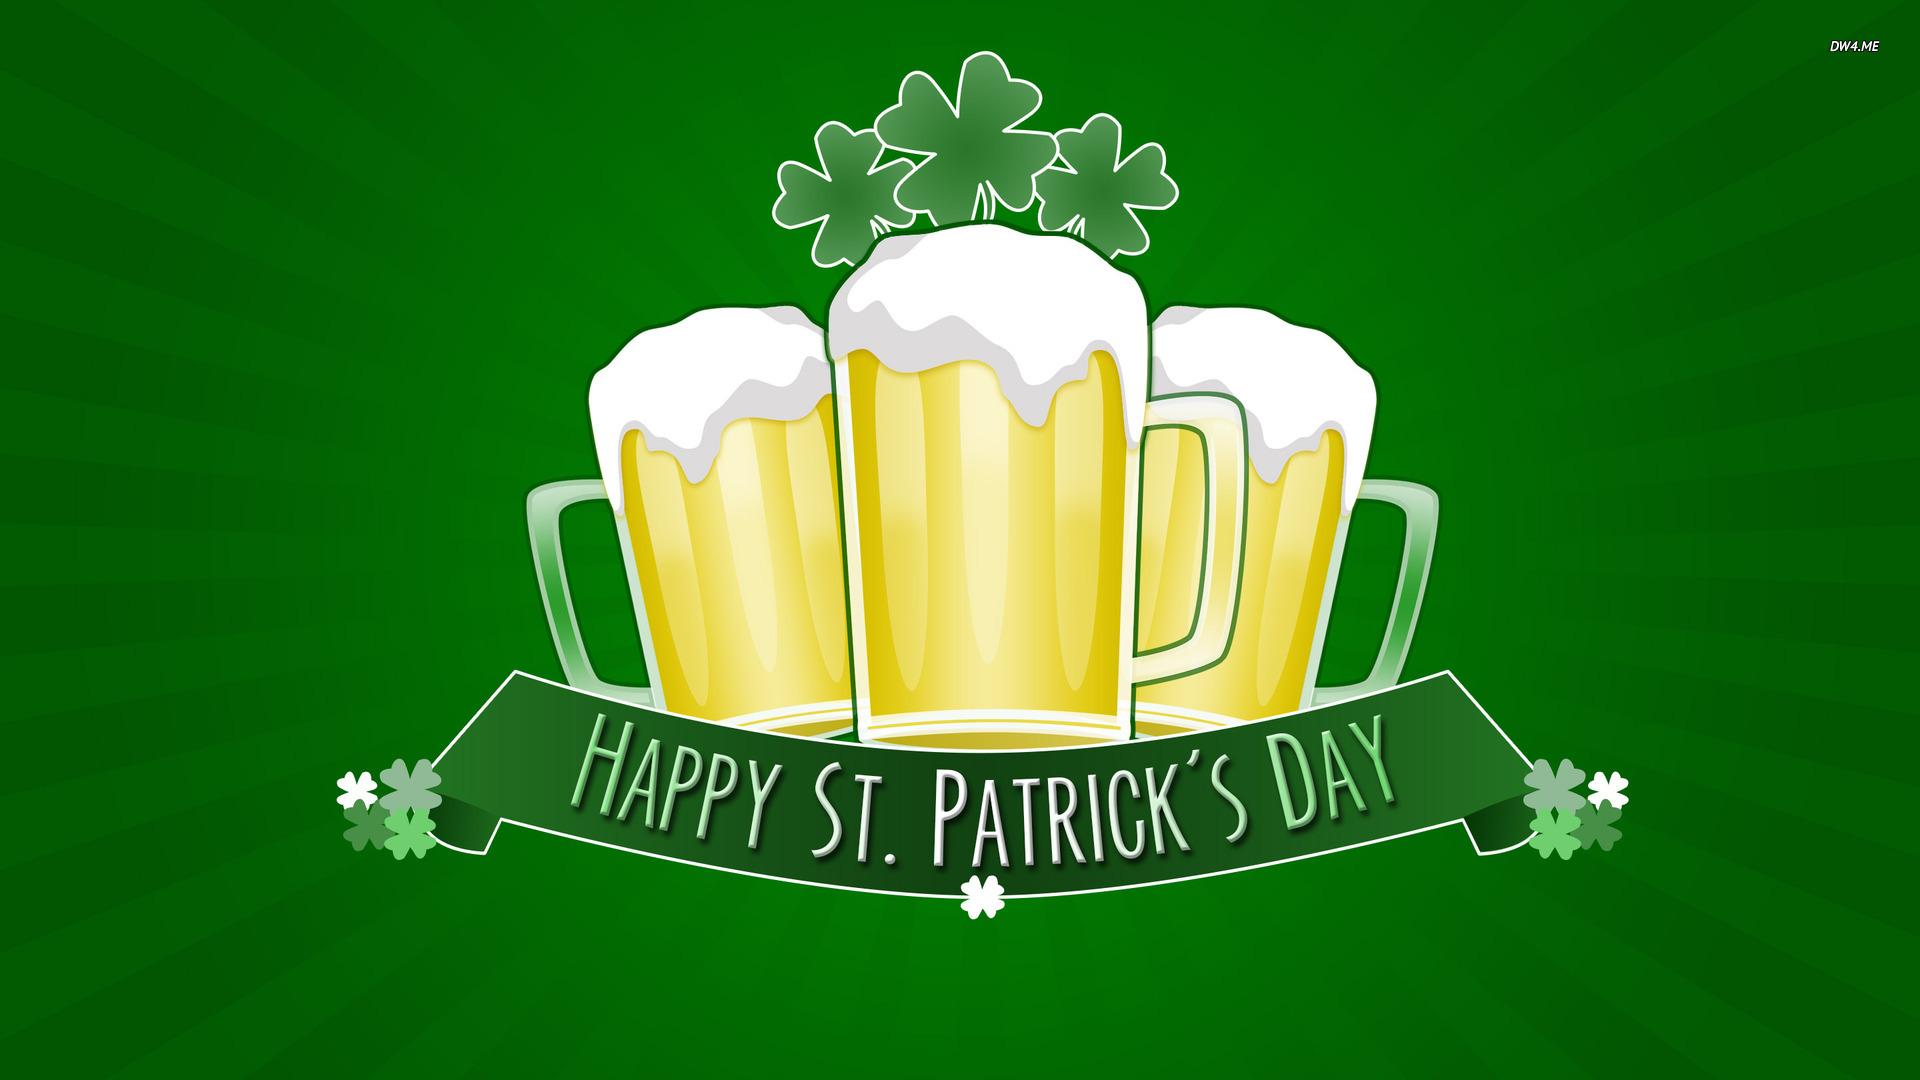 Happy Saint Patrick S Day Happy S T Patrick S Day My Fans